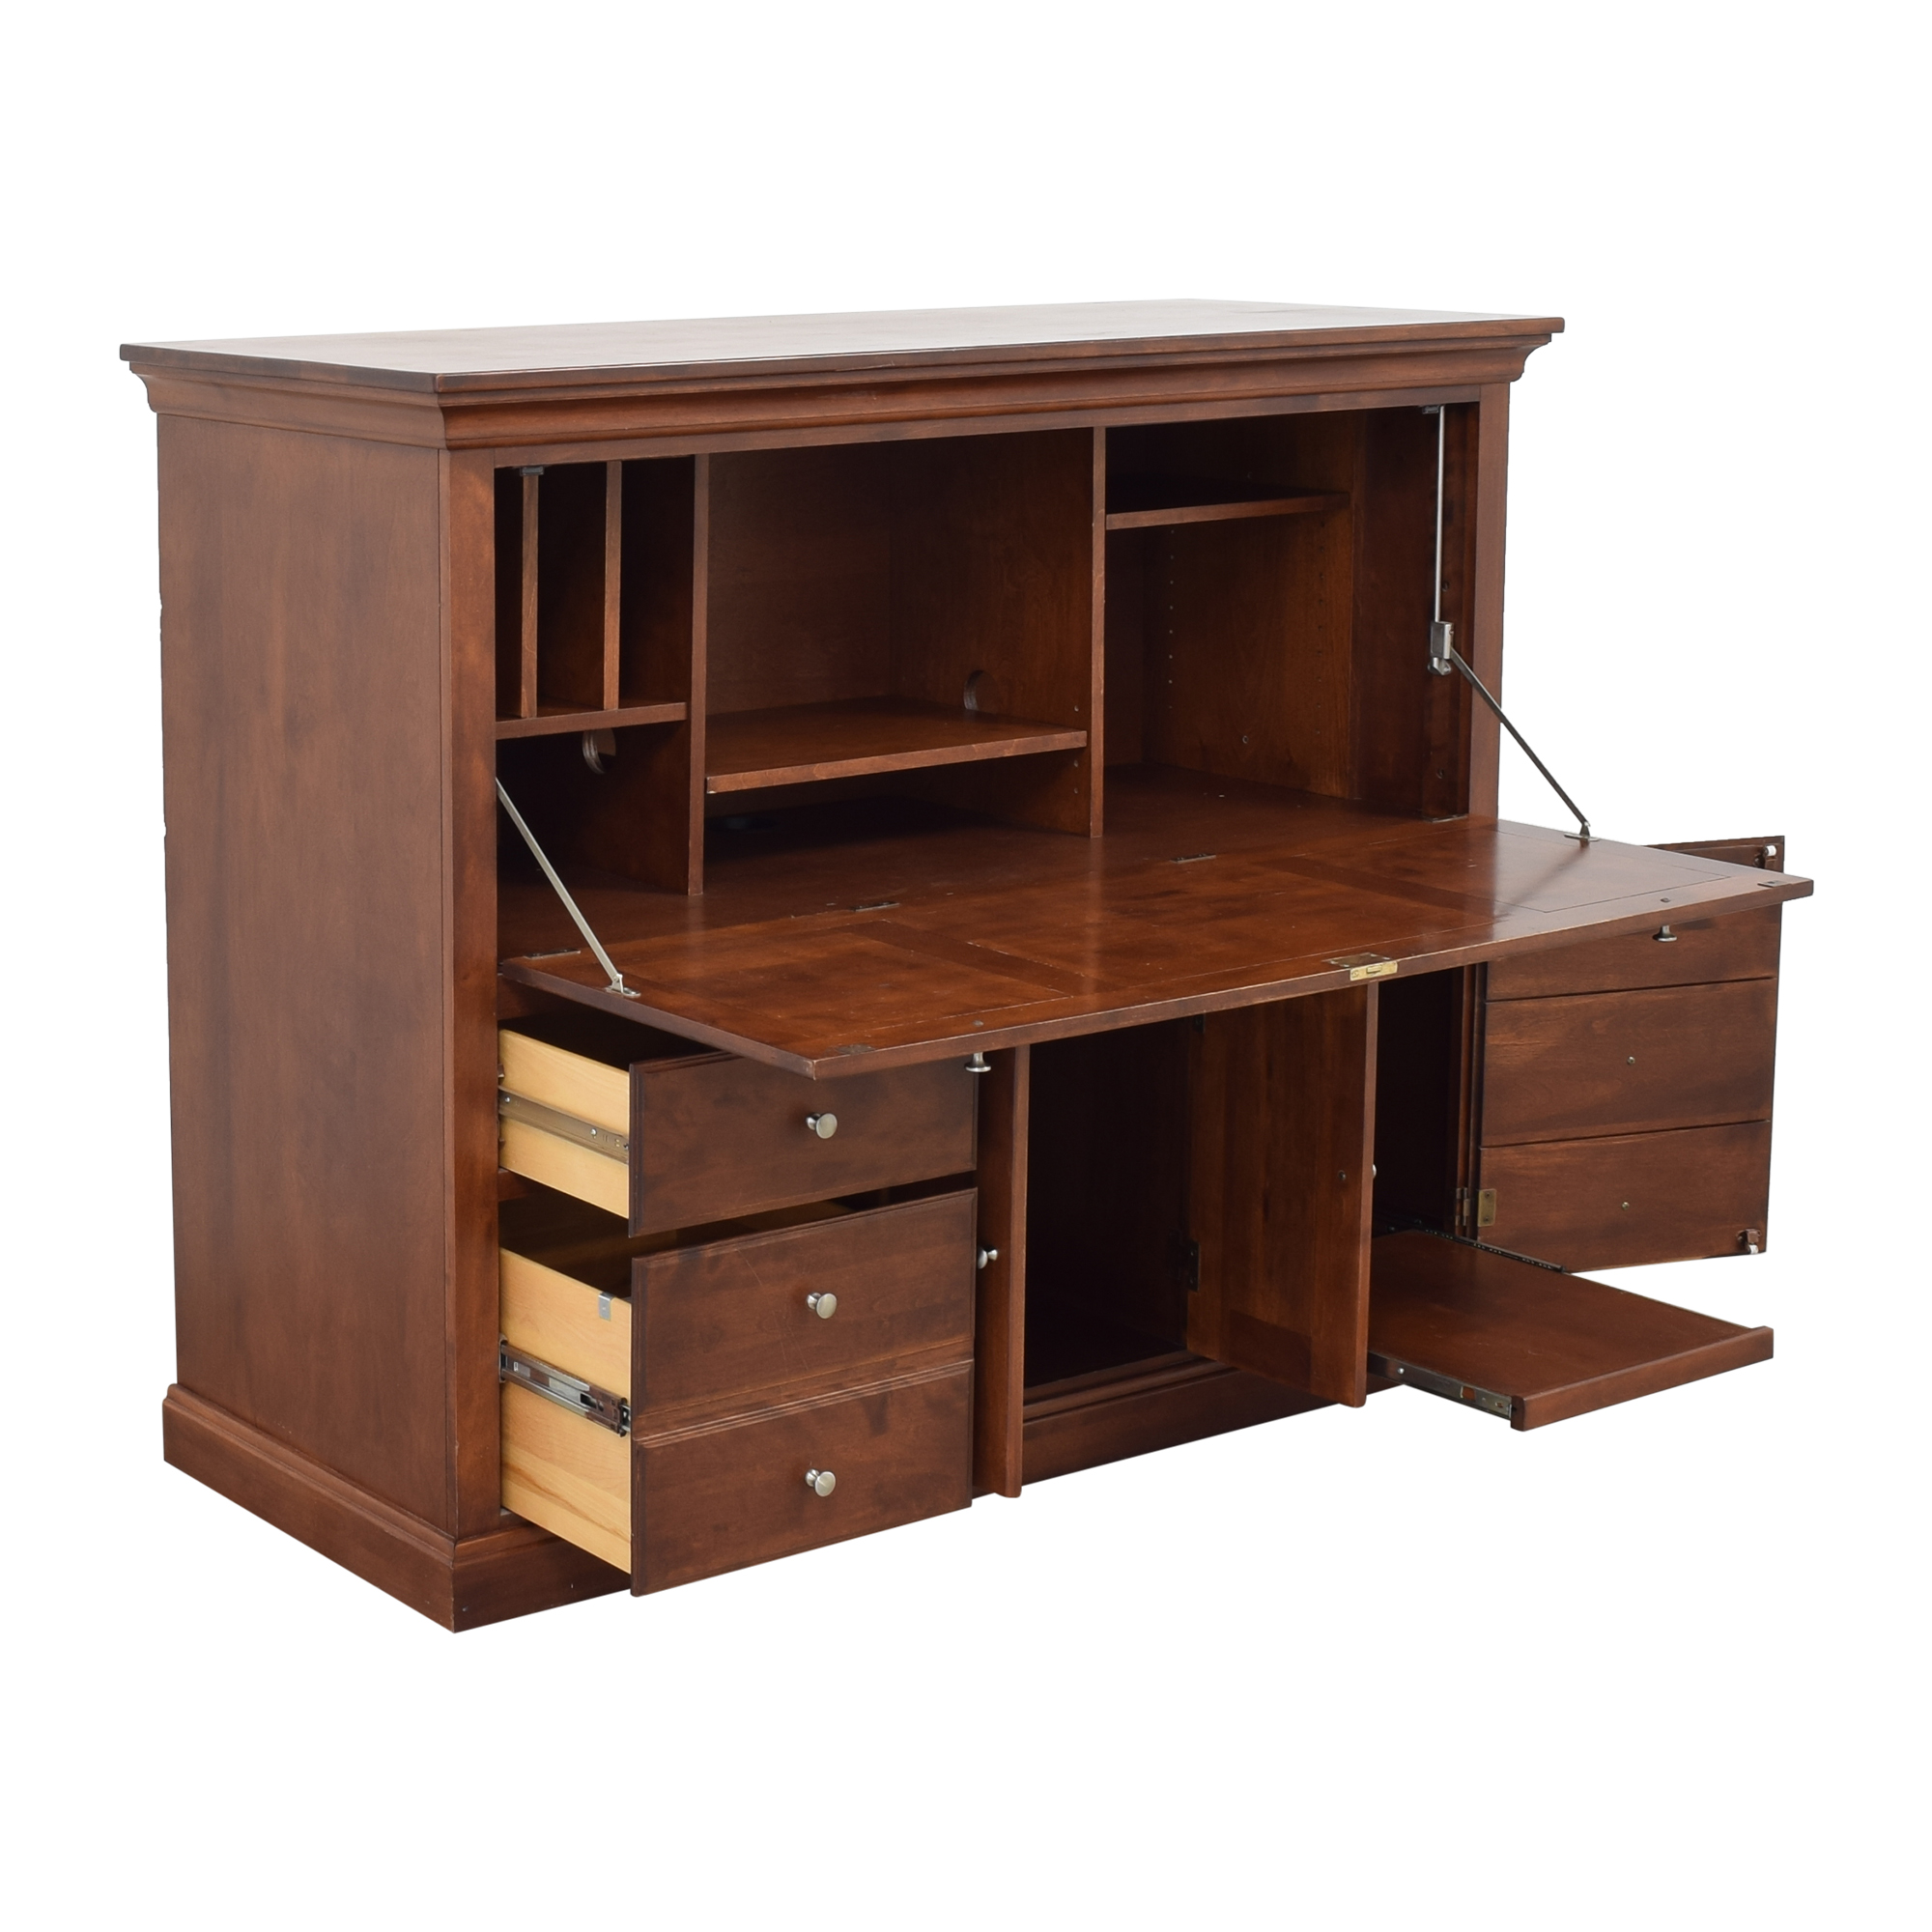 42% OFF - Nichols & Stone Nichols & Stone Computer Desk Cabinet / Storage